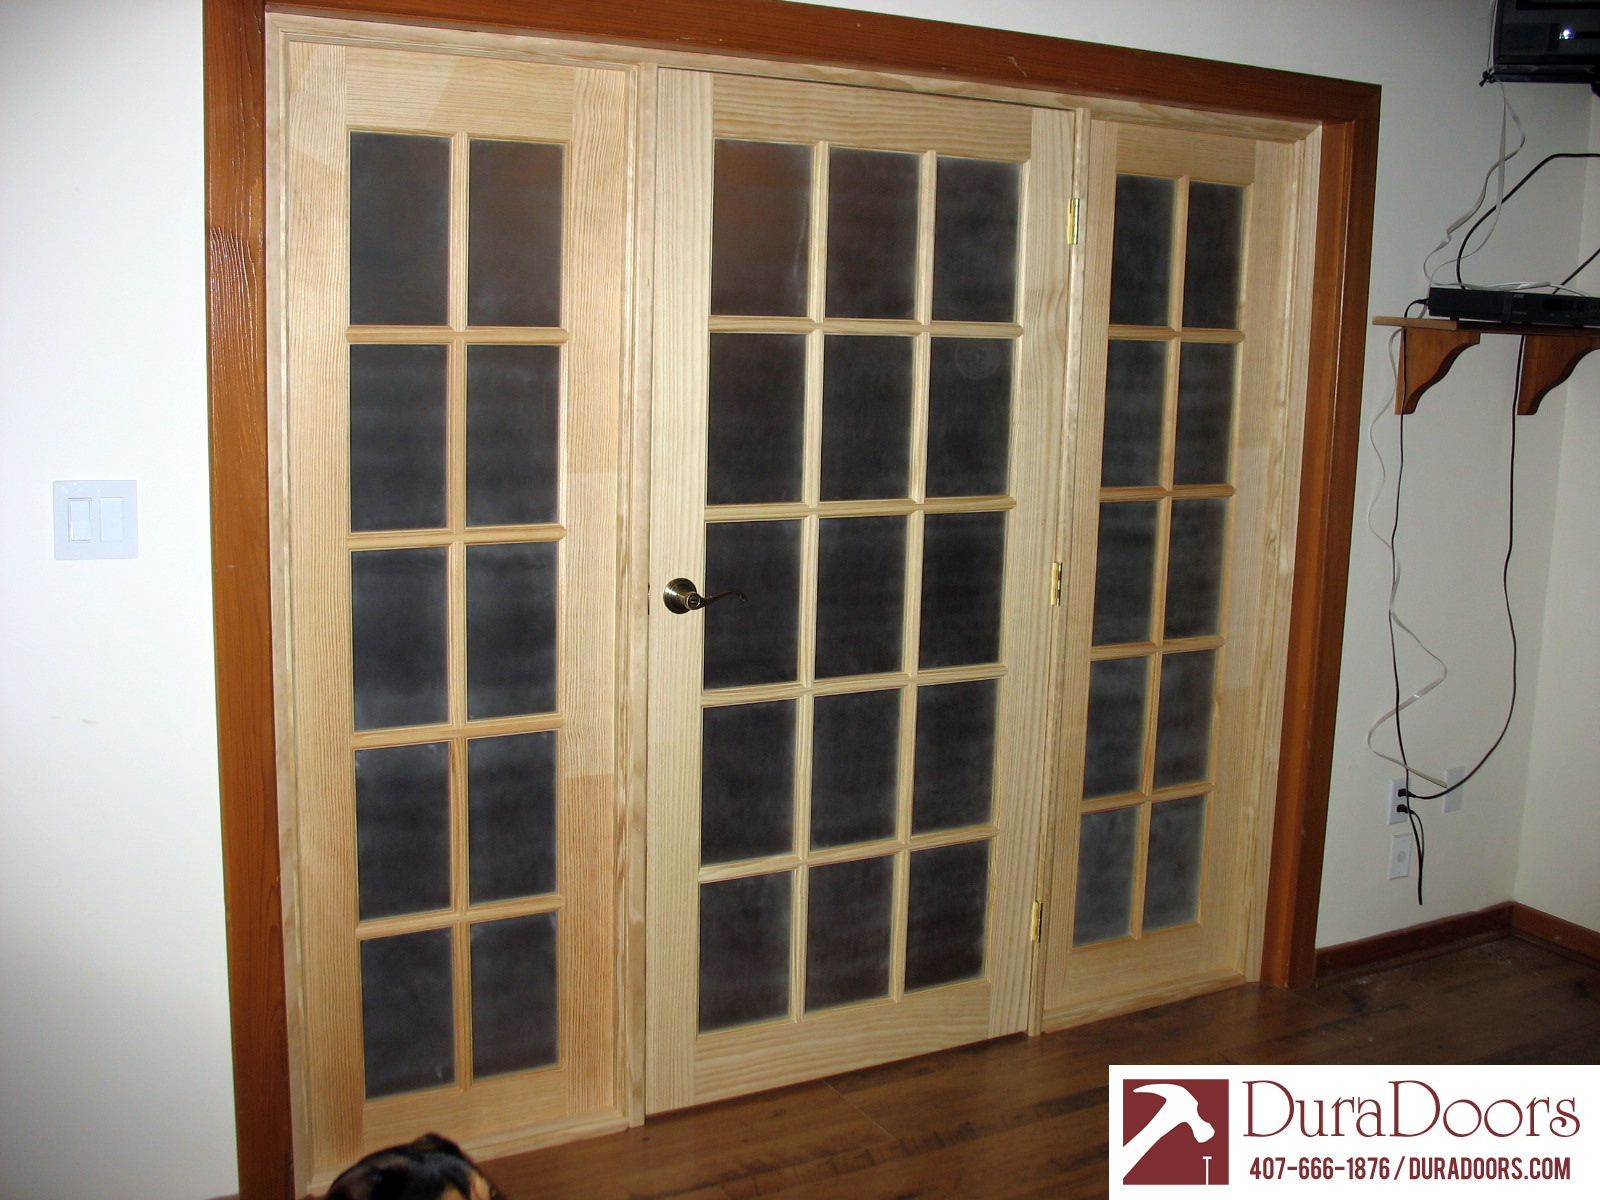 Modern French Doors Interior. custom interior french doors